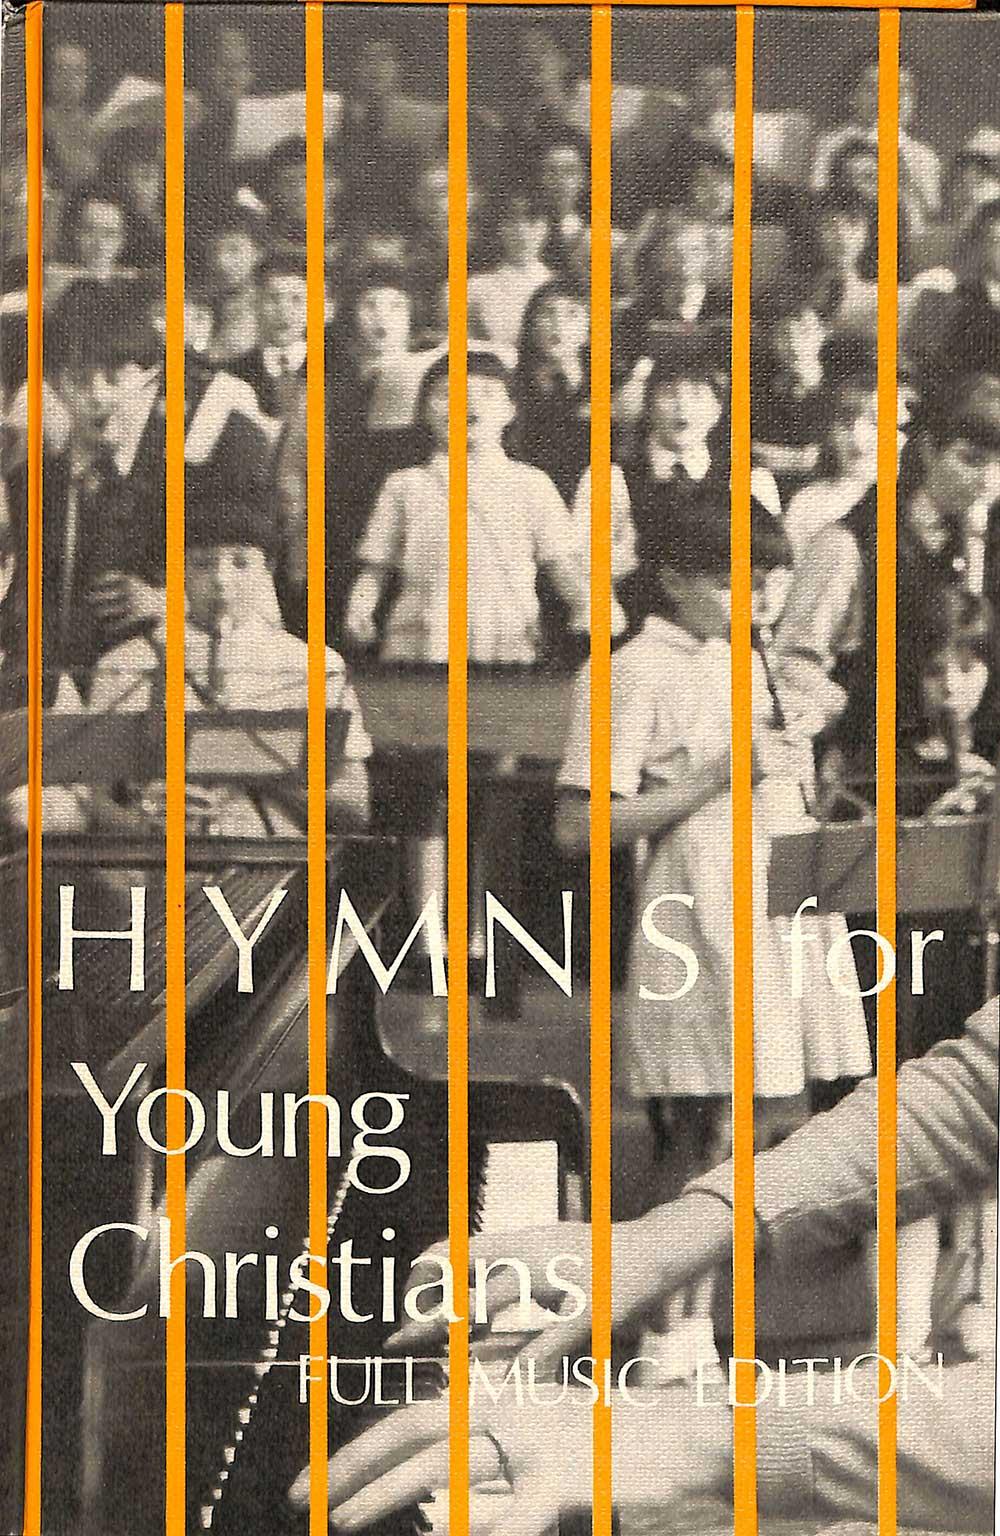 Winifred Wilson (editor). <em>Hymns for young Christians.</em> Full music edition. London: Geoffrey Chapman, 1967.